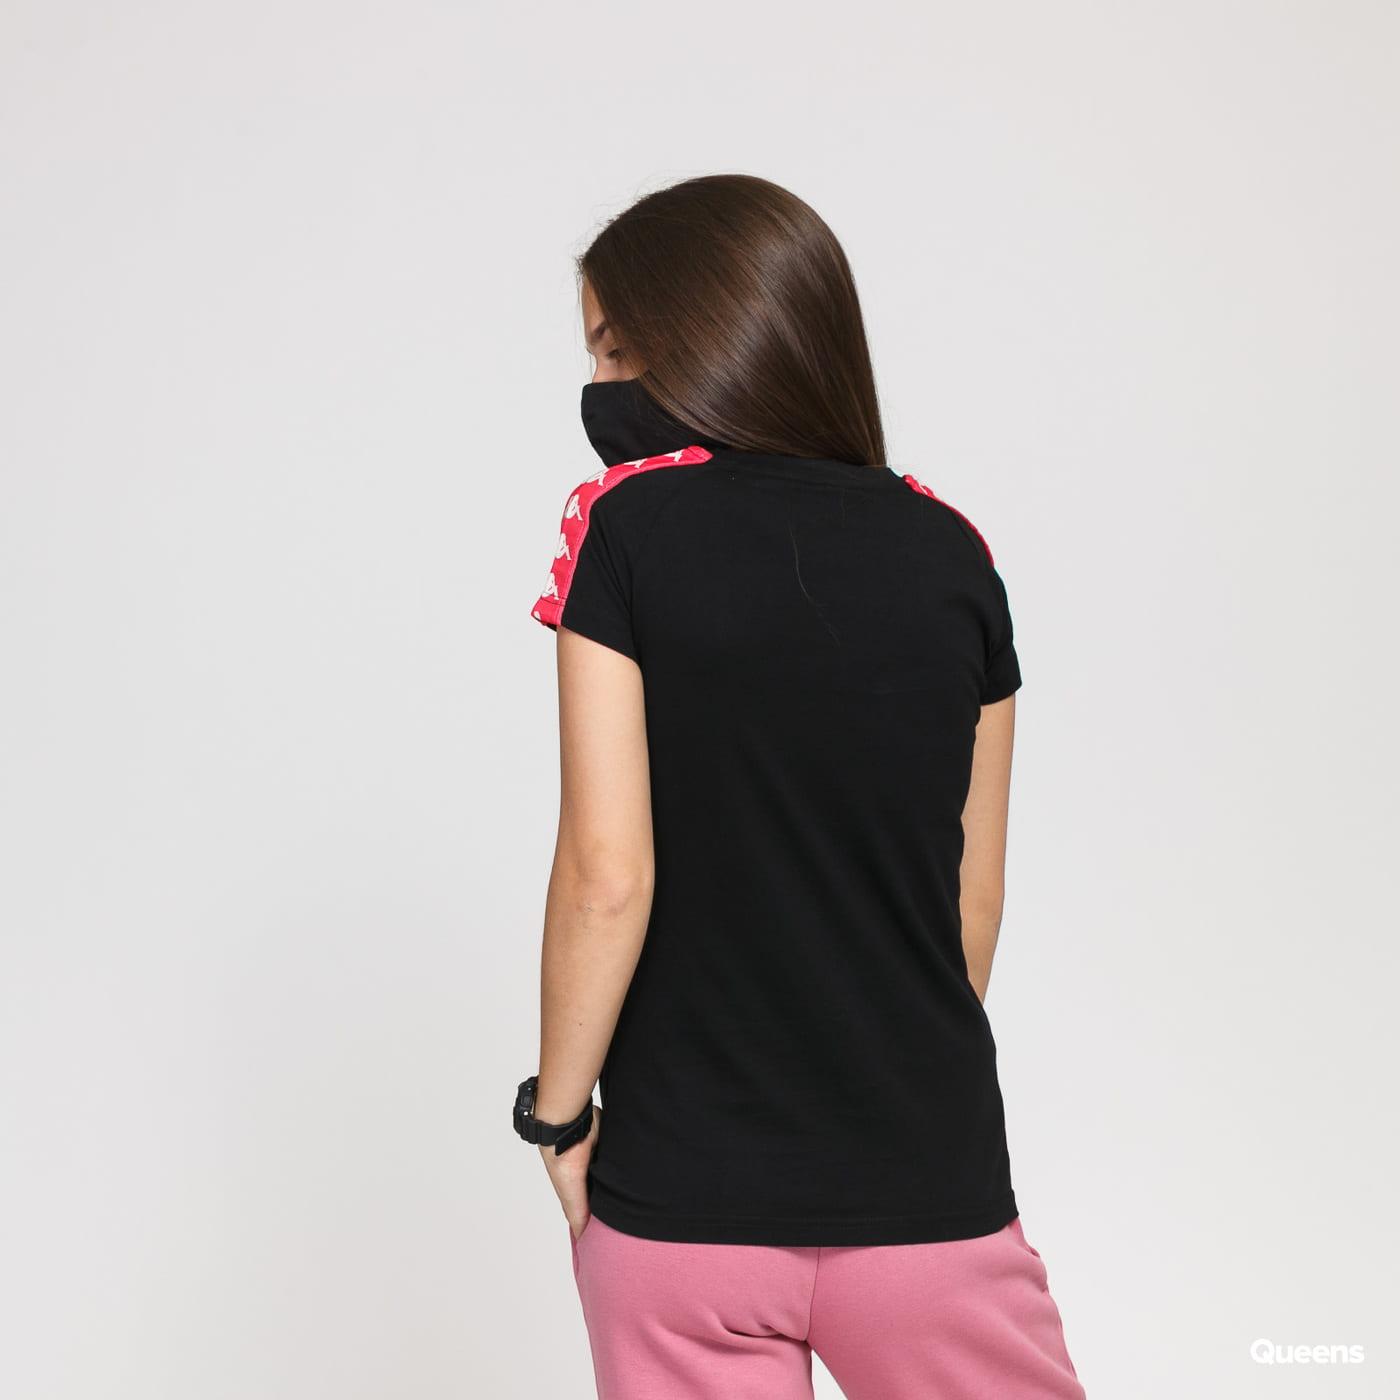 Kappa Banda Woen Tee black / pink / white